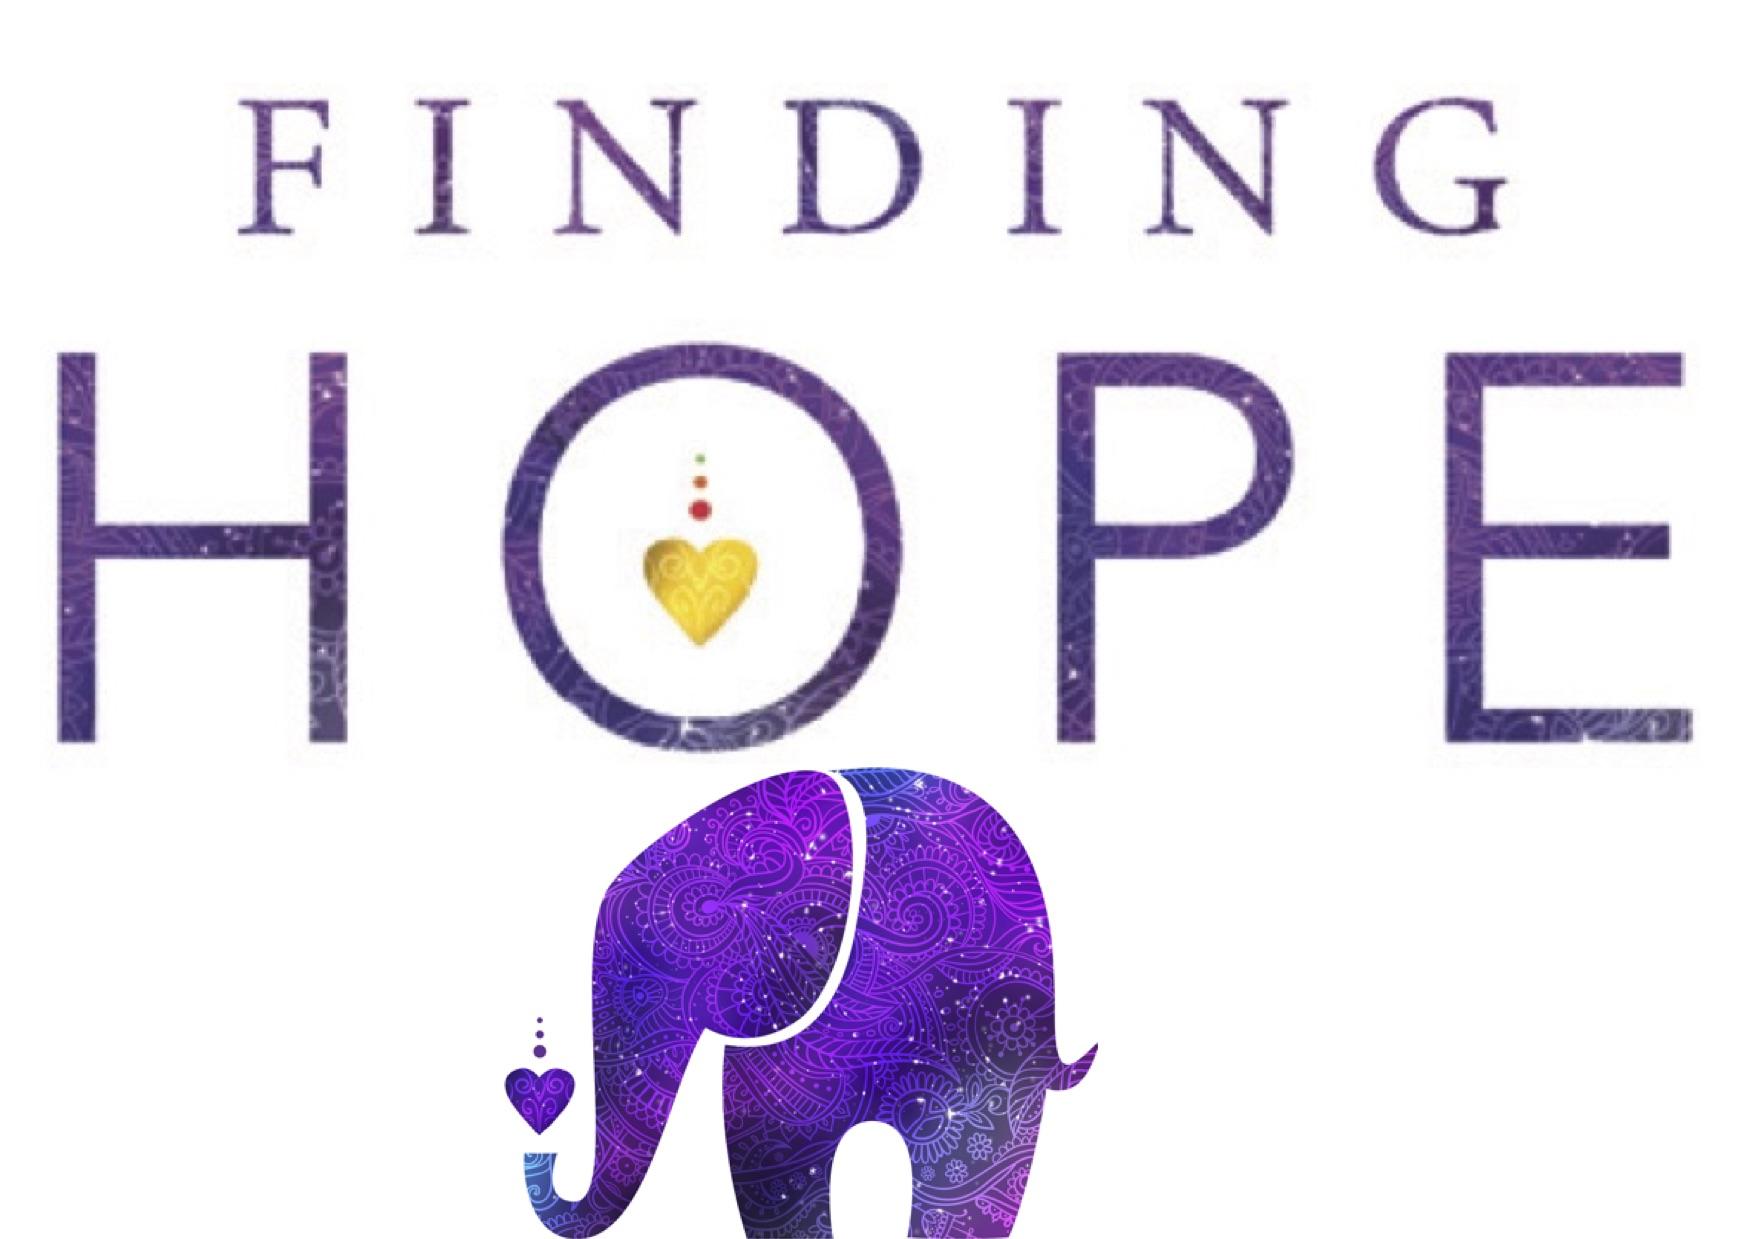 finding hope graphic jpeg.jpg